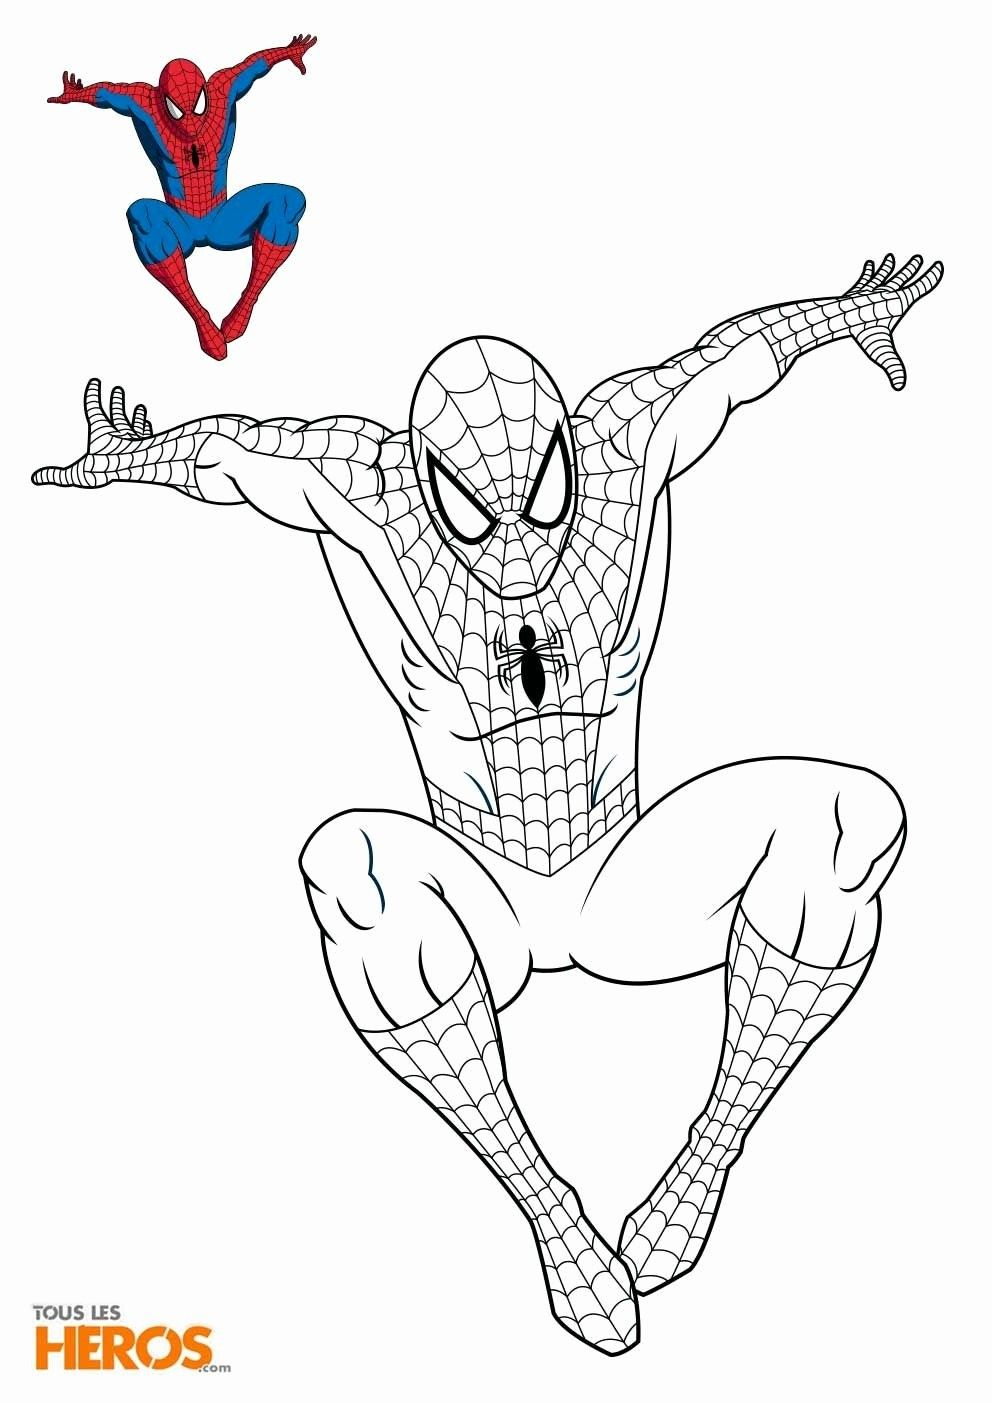 Top 20 Free Printable Superhero Coloring Pages Online Batman Coloring Pages Cartoon Coloring Pages Superhero Coloring